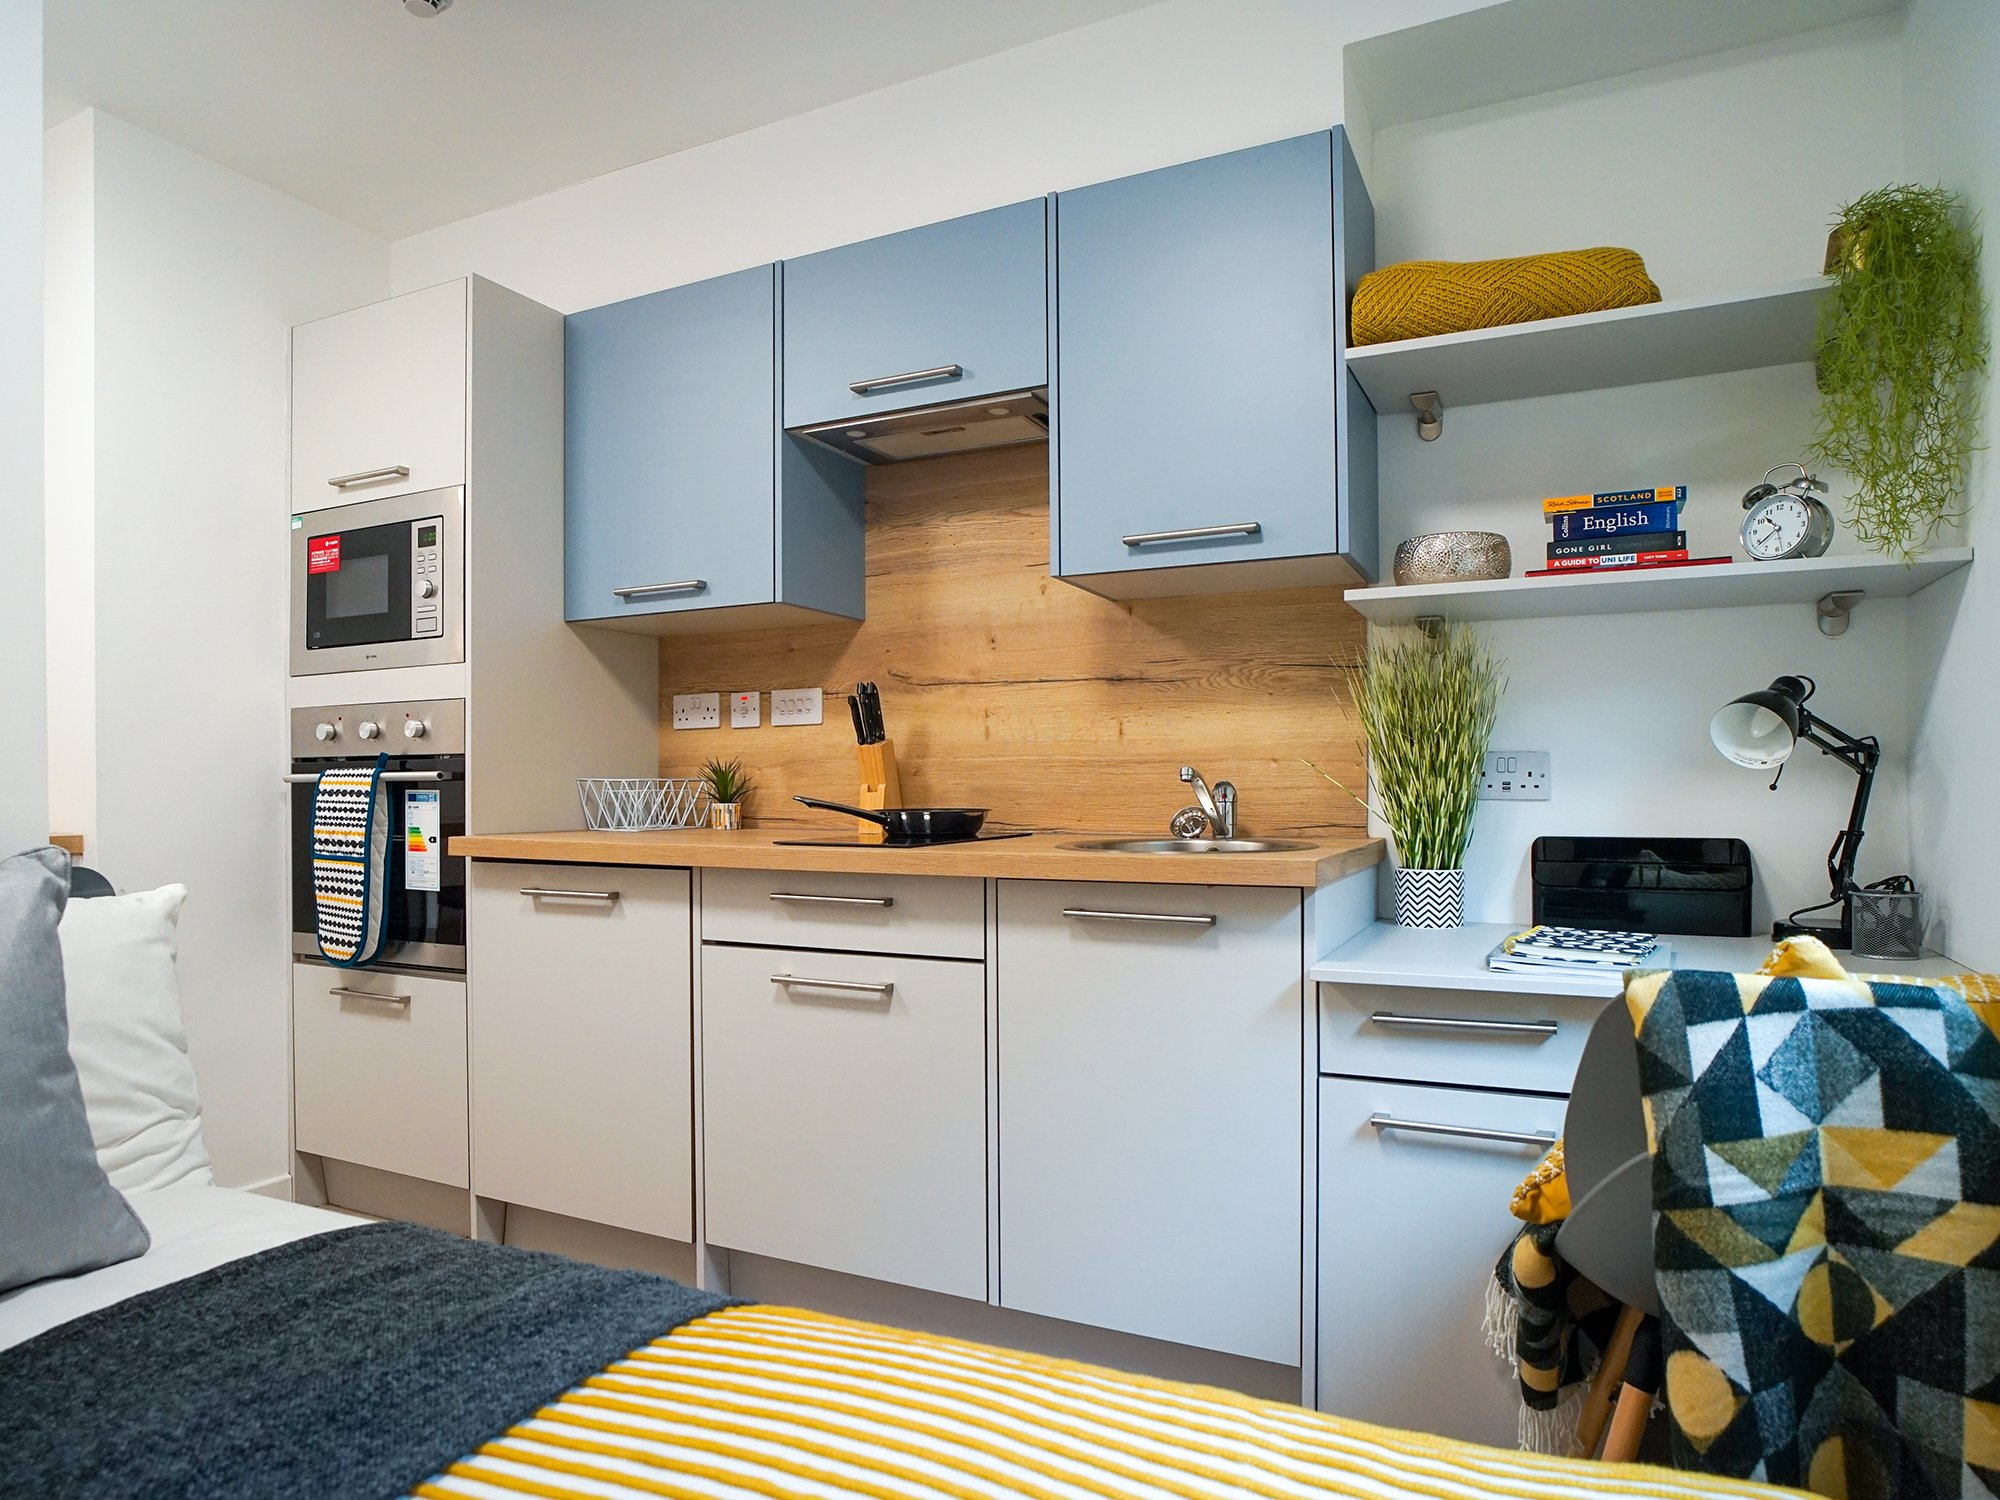 student-accommodation-edinburgh-goods-corner-standard-studio (2)